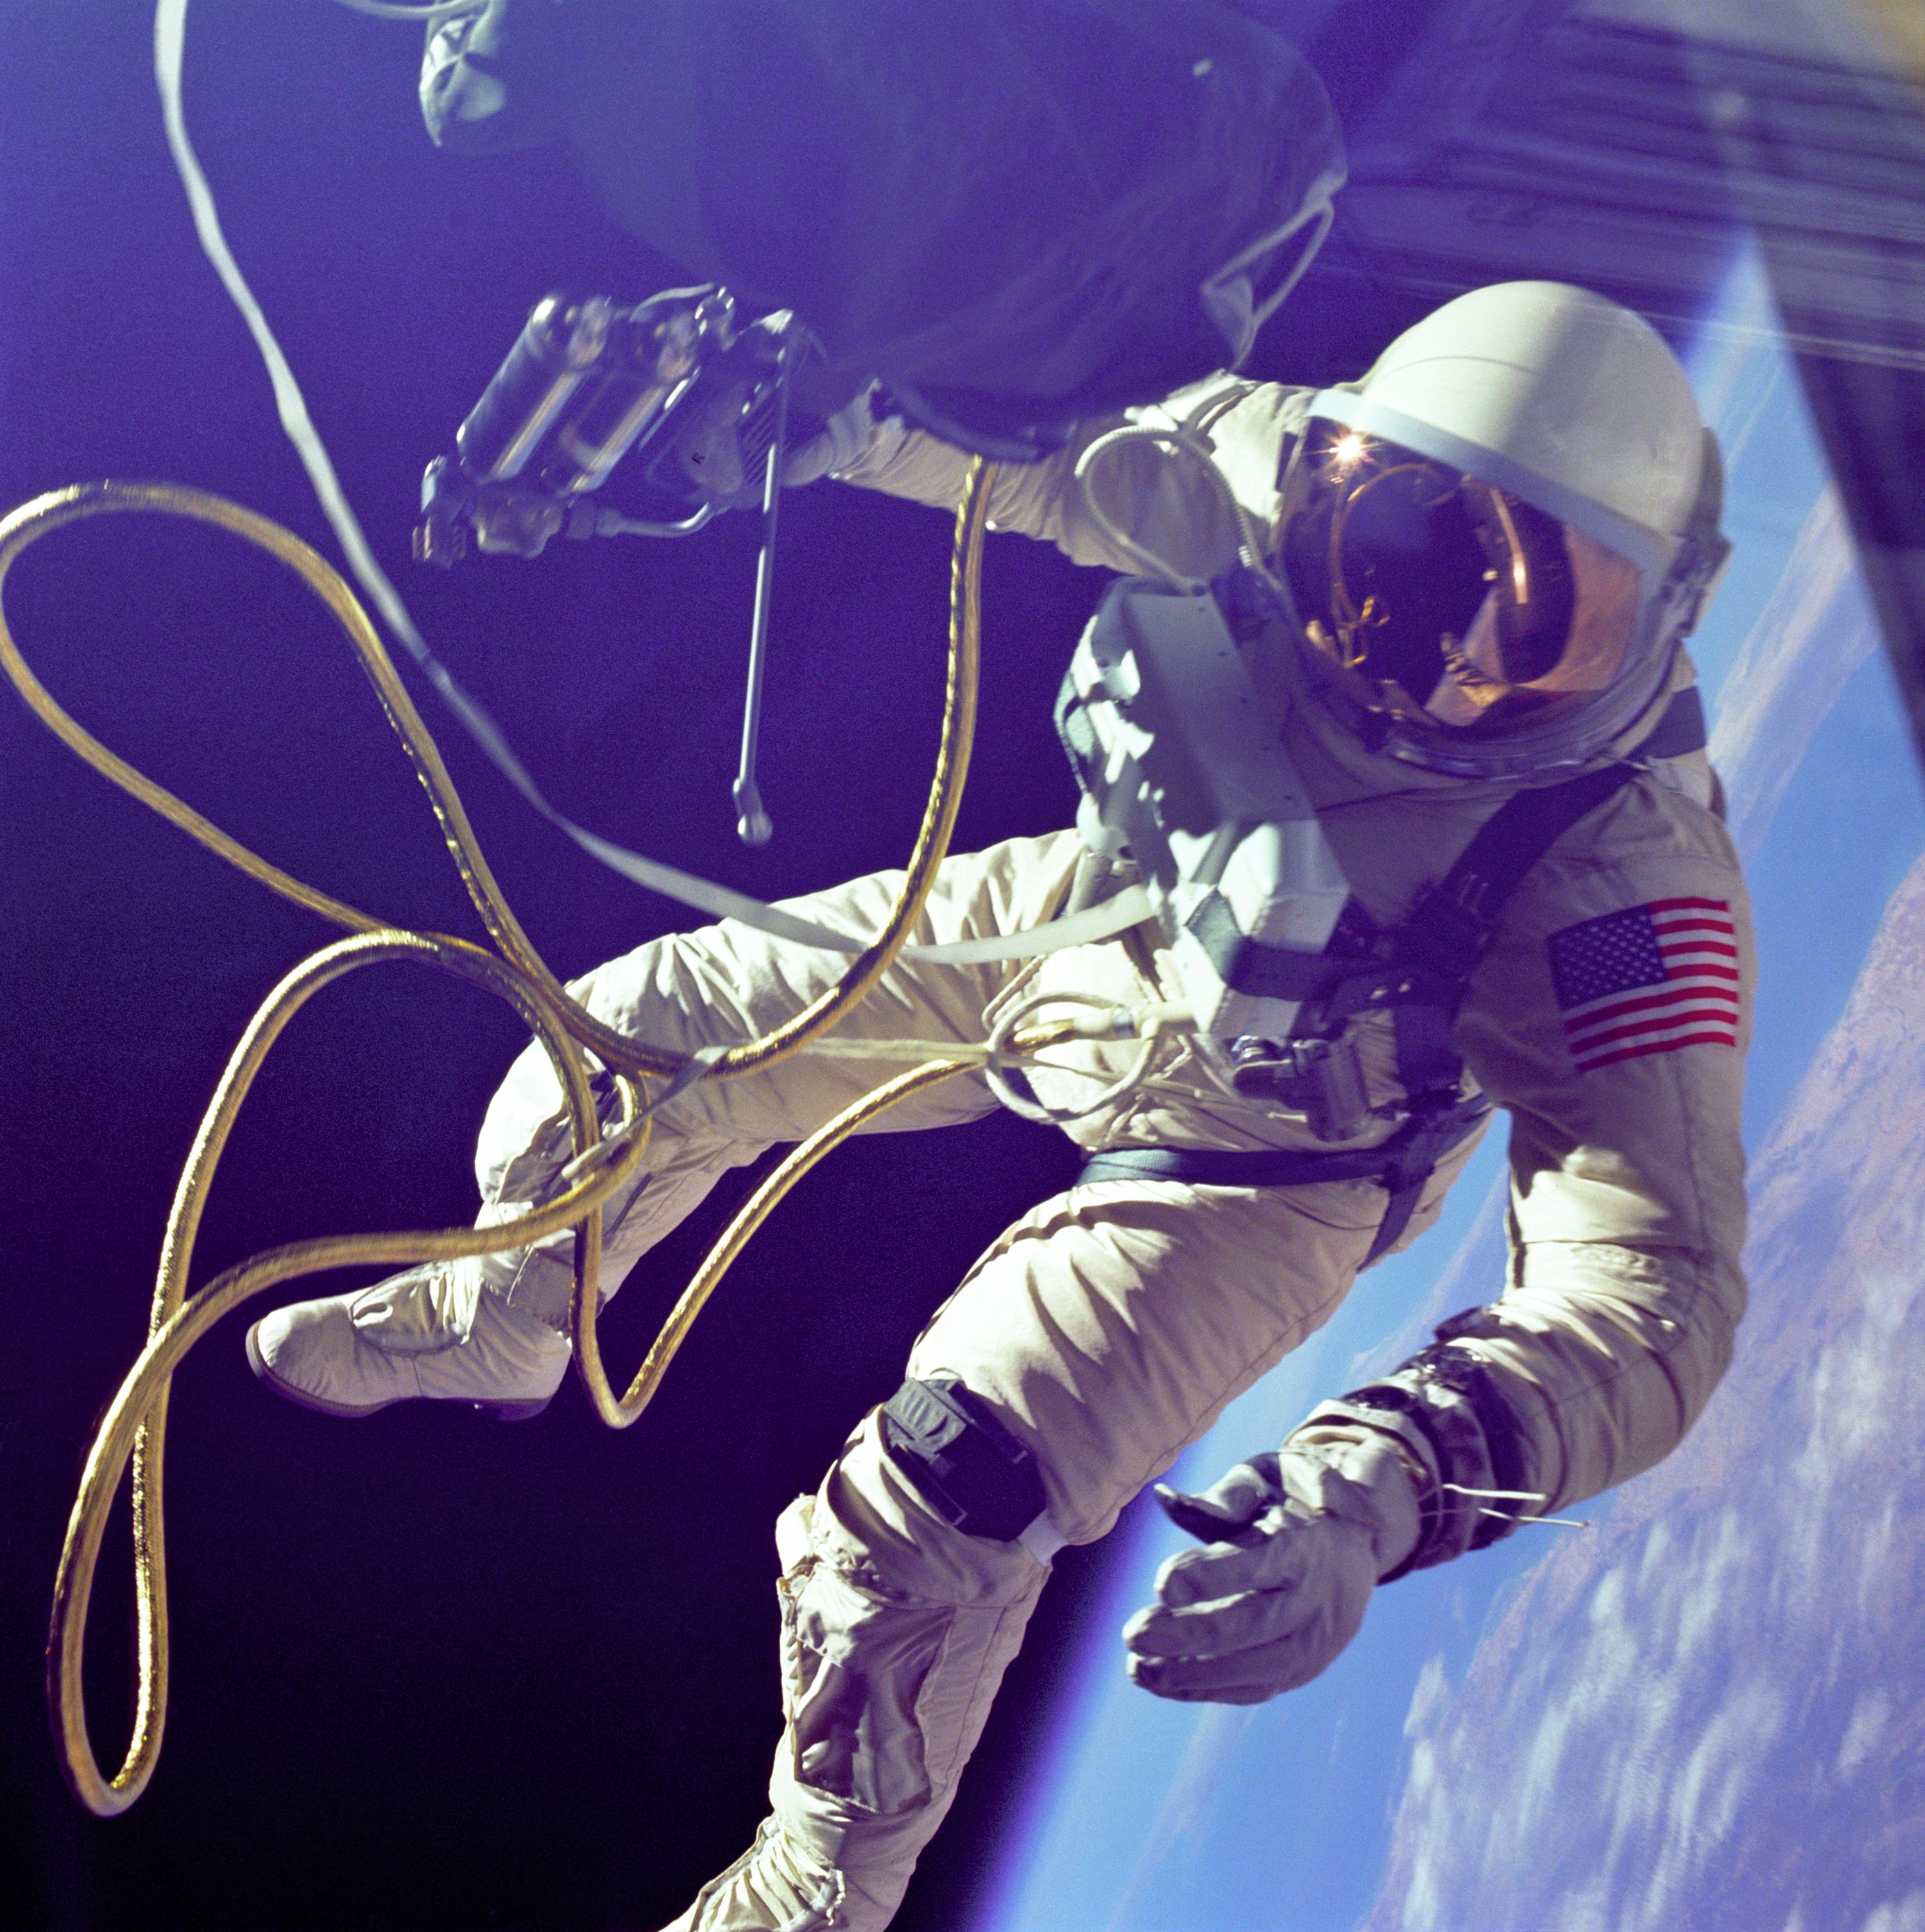 Ed_White_First_American_Spacewalker_-_GP